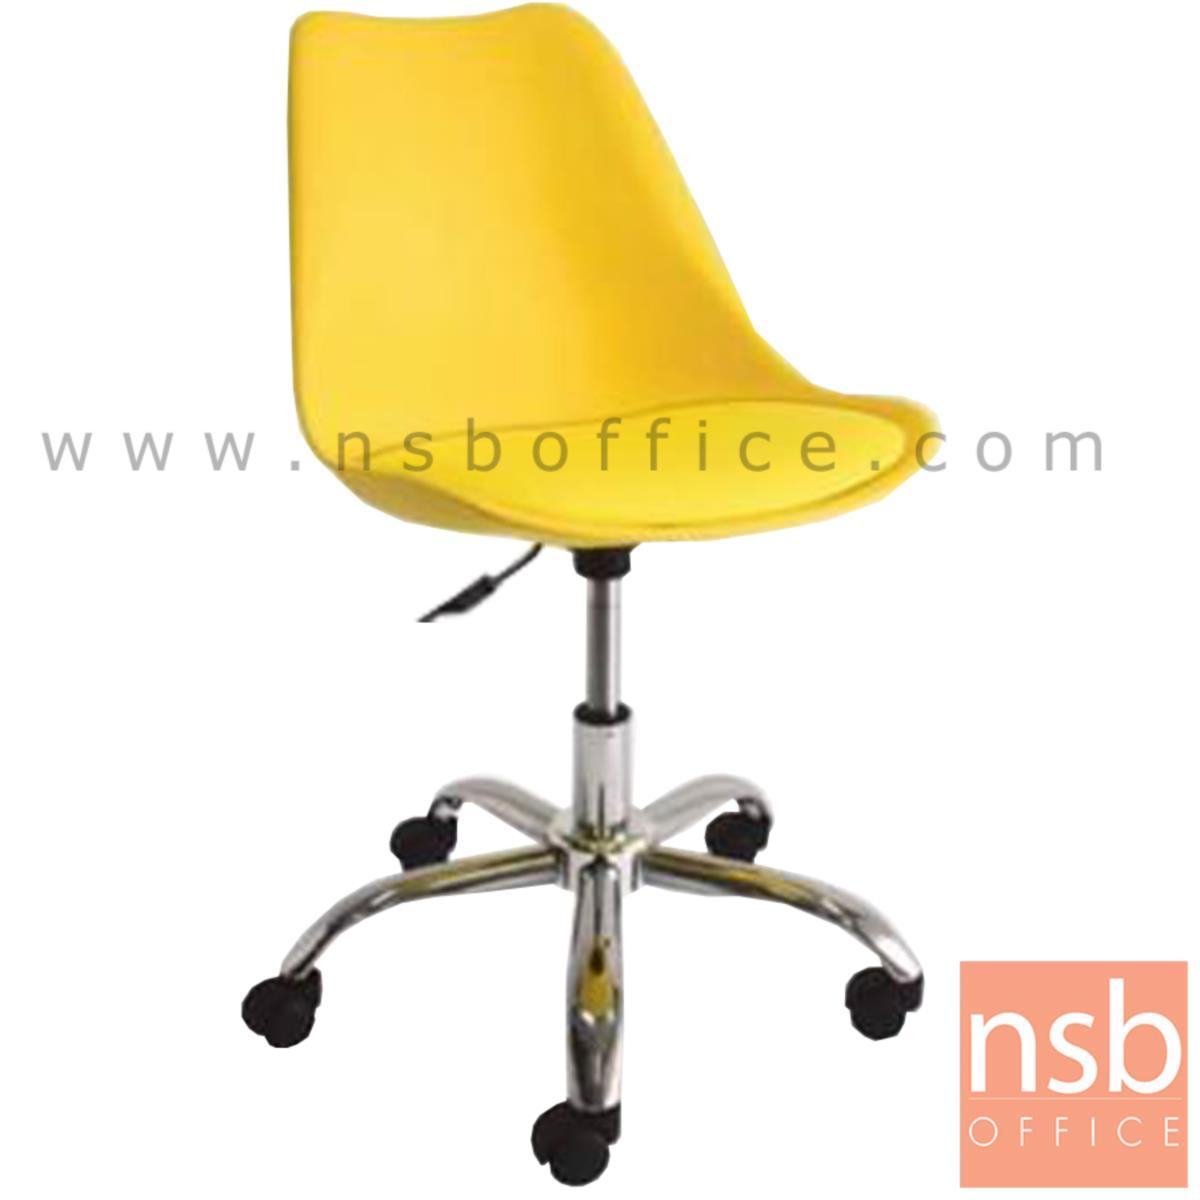 B24A236:เก้าอี้สำนักงานโพลี่ รุ่น D-GN  โช๊คแก๊ส ขาเหล็กชุบโครเมียม